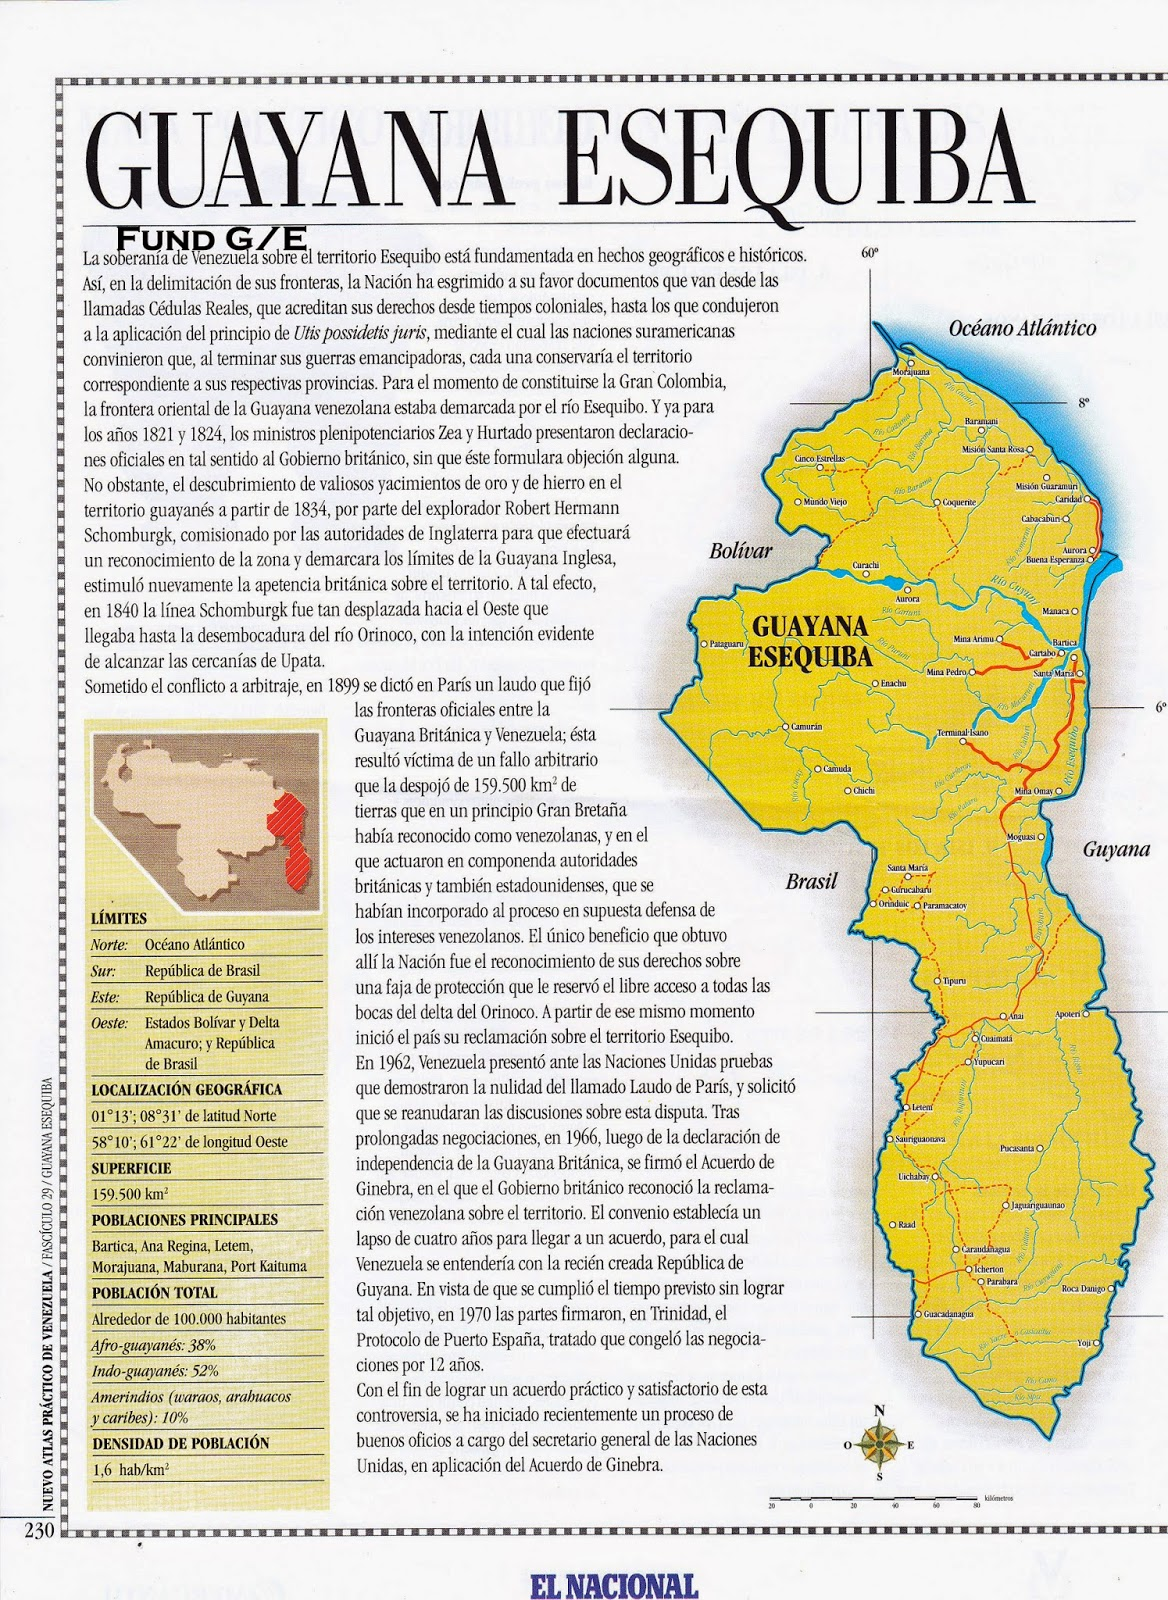 2001 – Mapa Político de la